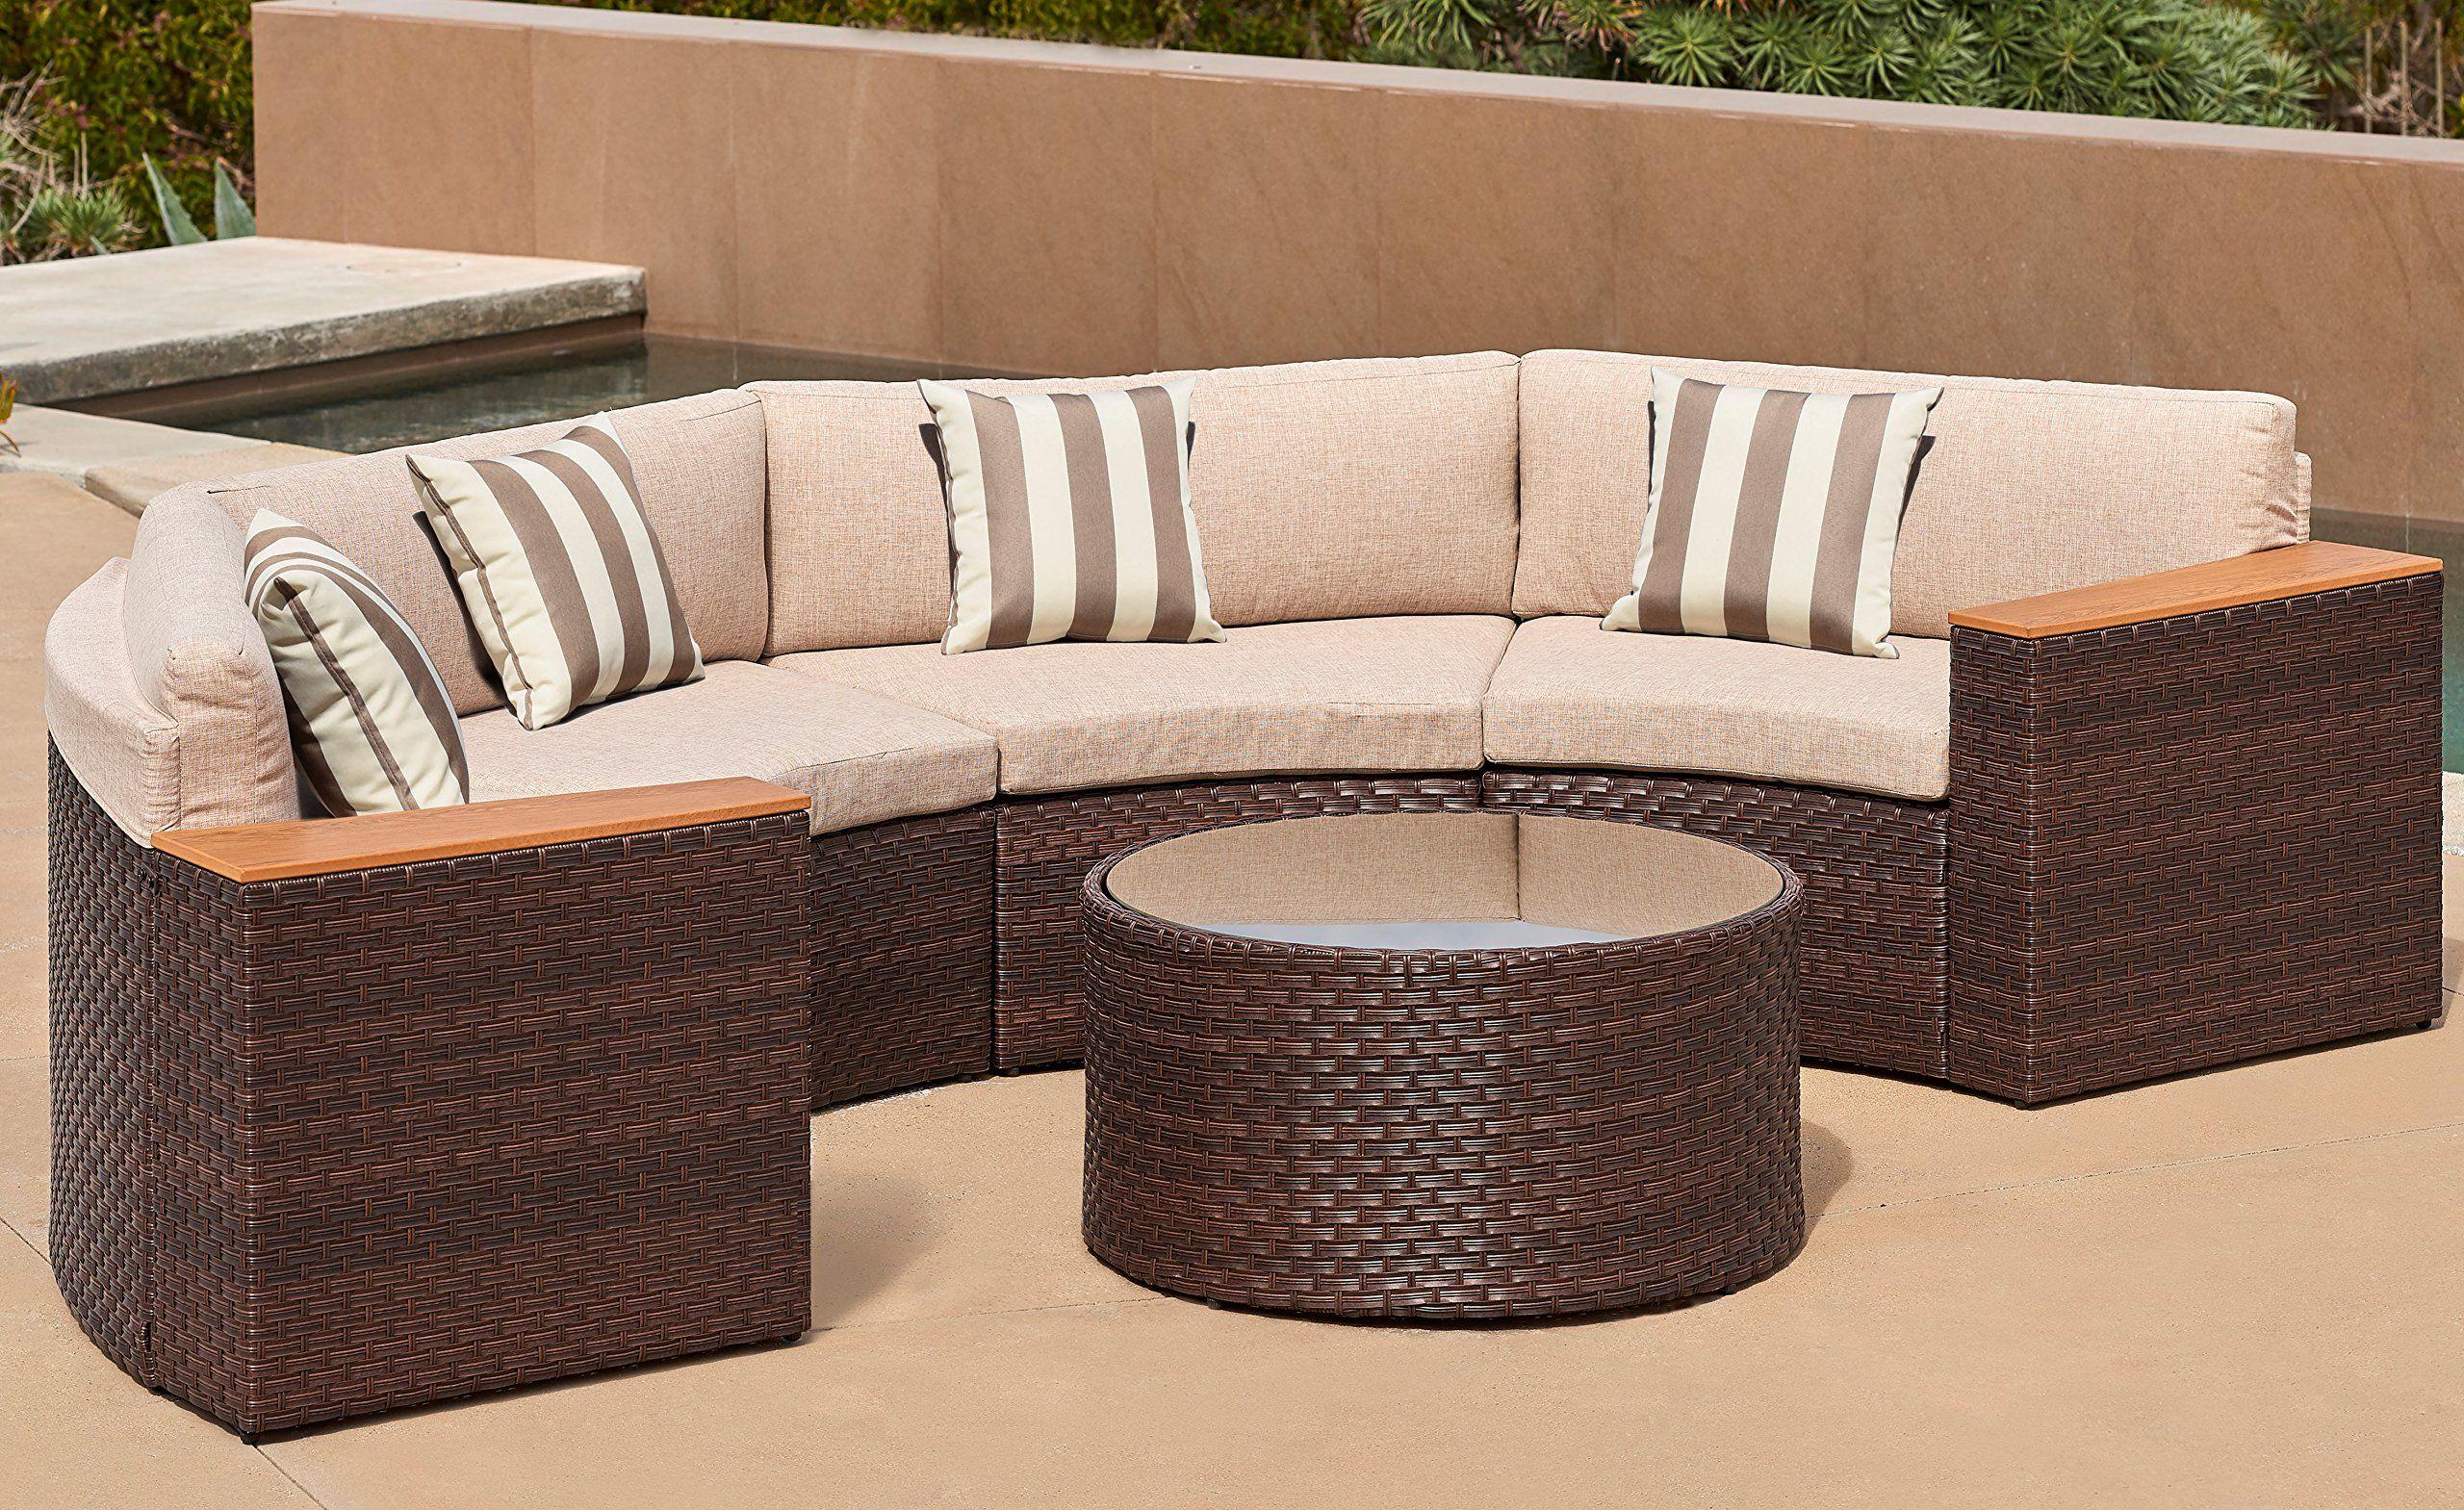 Solaura Outdoor 5piece Halfmoon Crescent Sectional Furniture Set